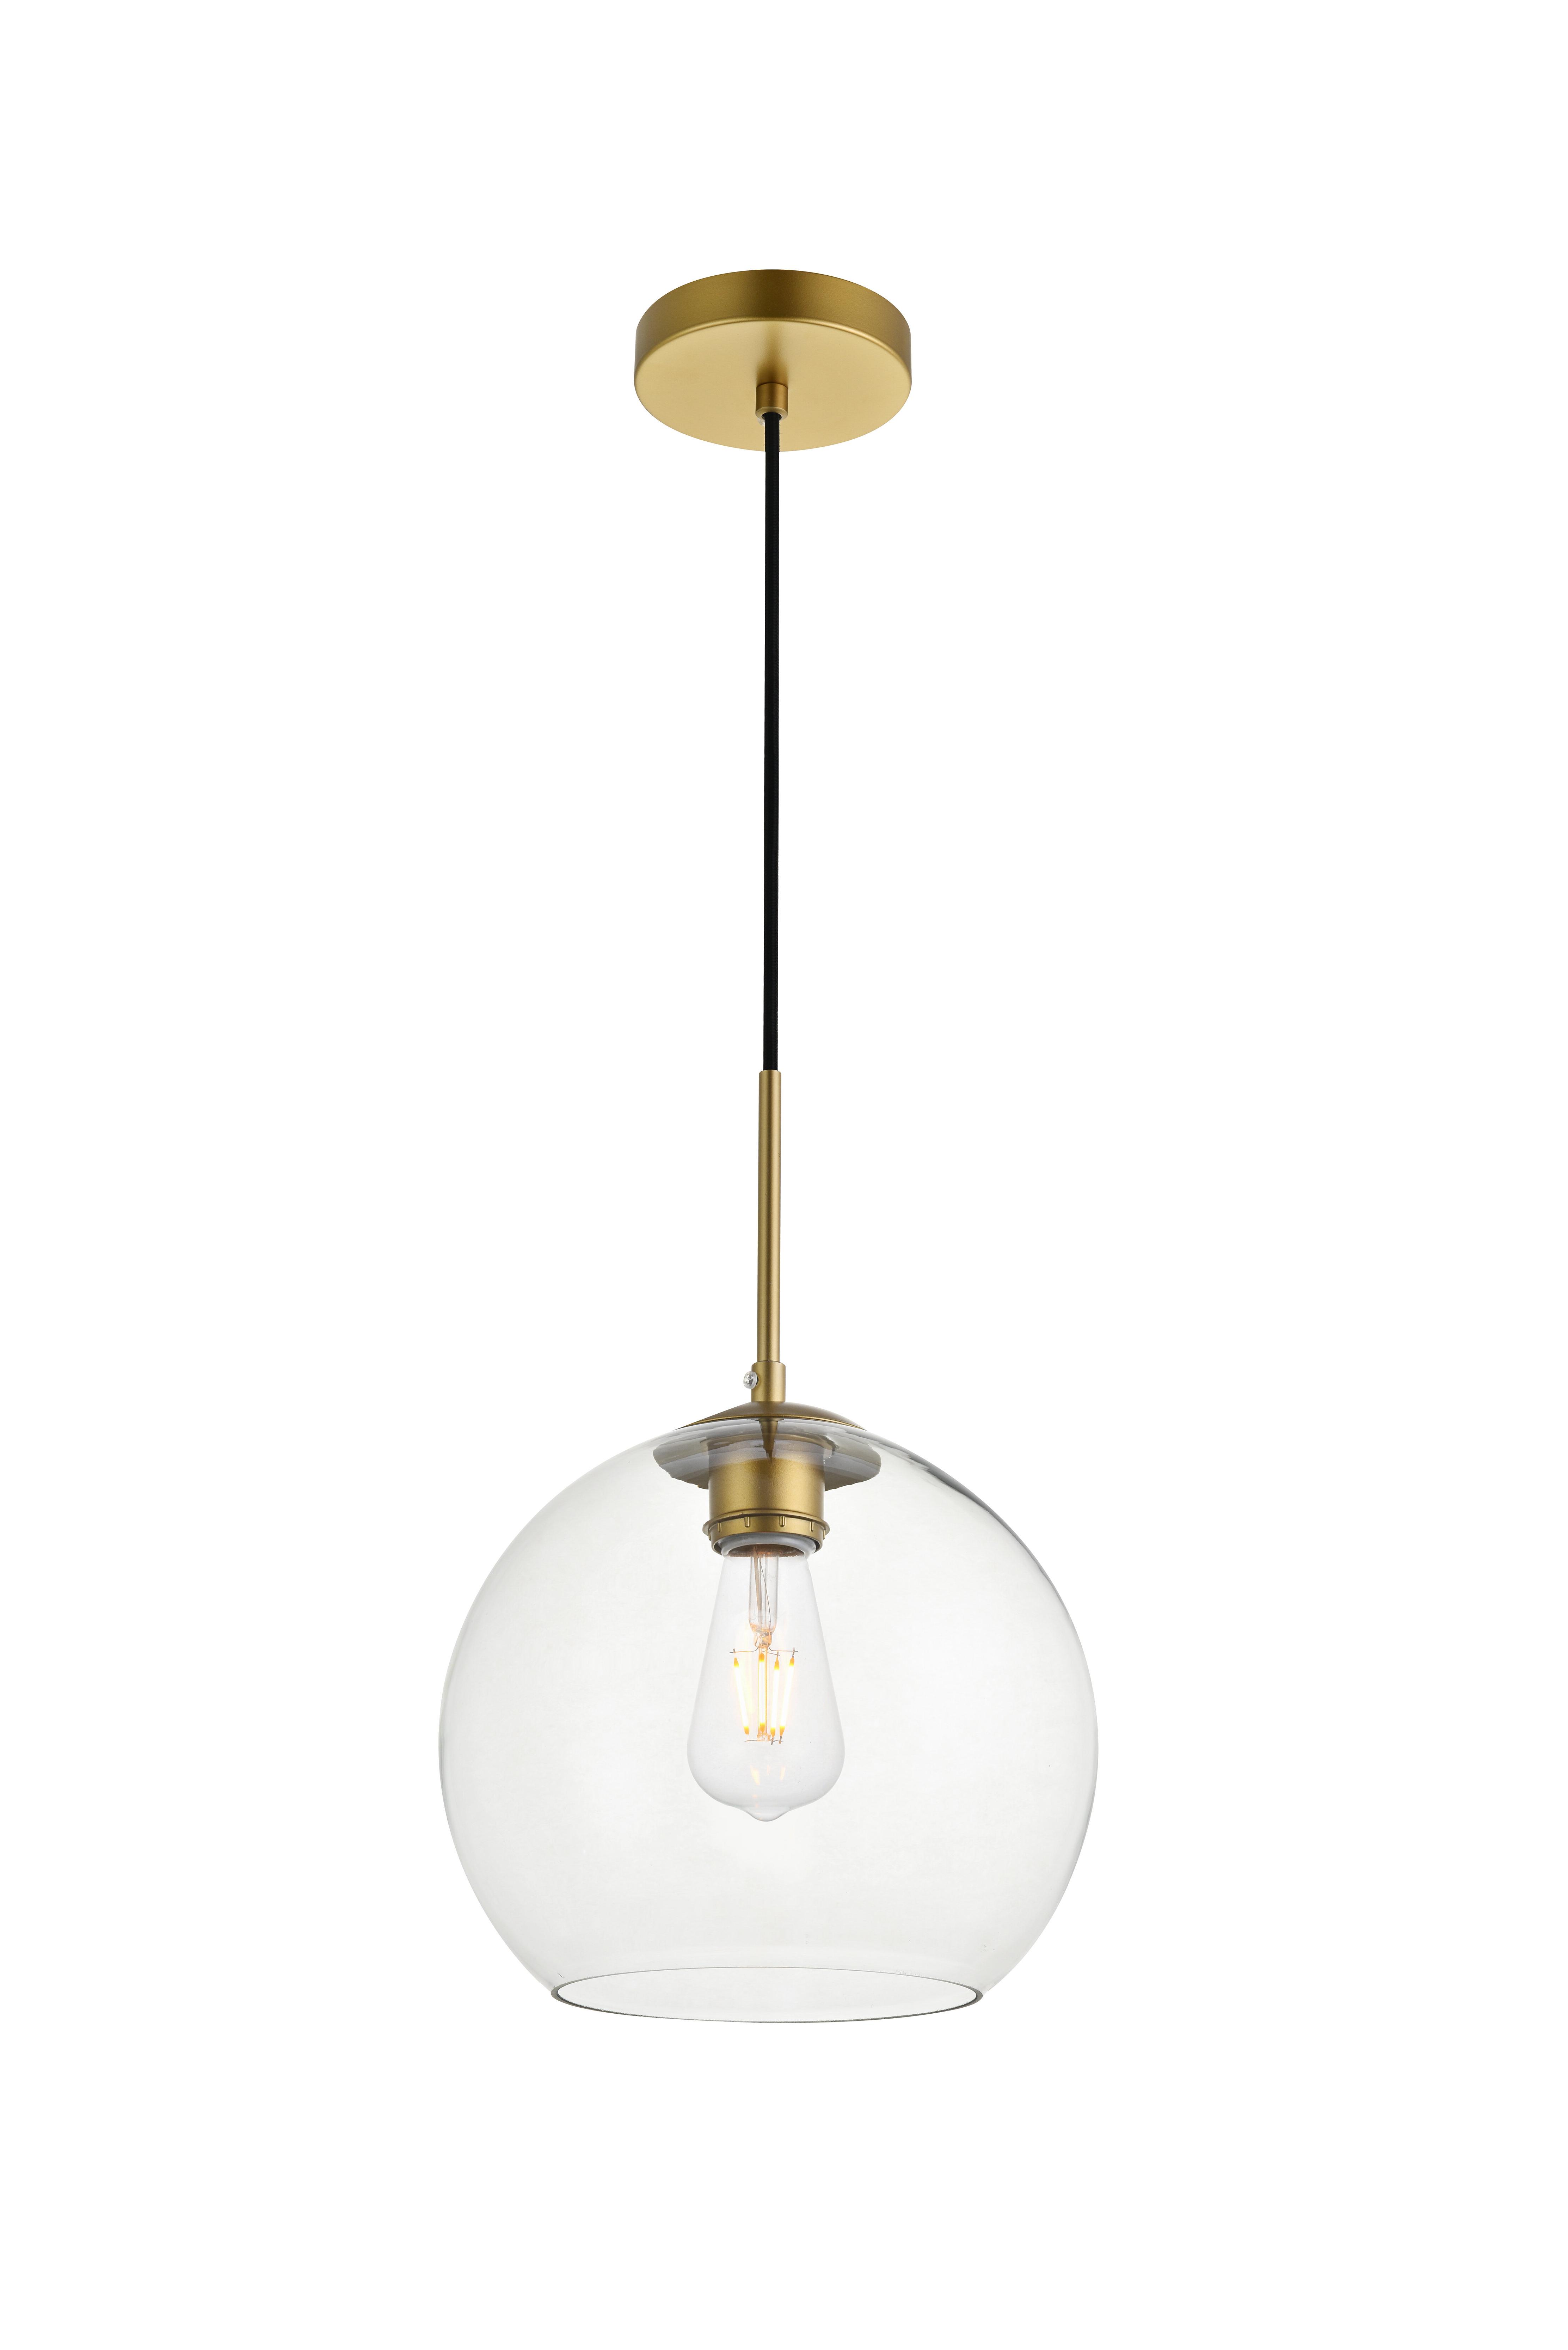 Yearwood 1 Light Single Globe Pendant Inside Widely Used Betsy 1 Light Single Globe Pendants (View 20 of 20)